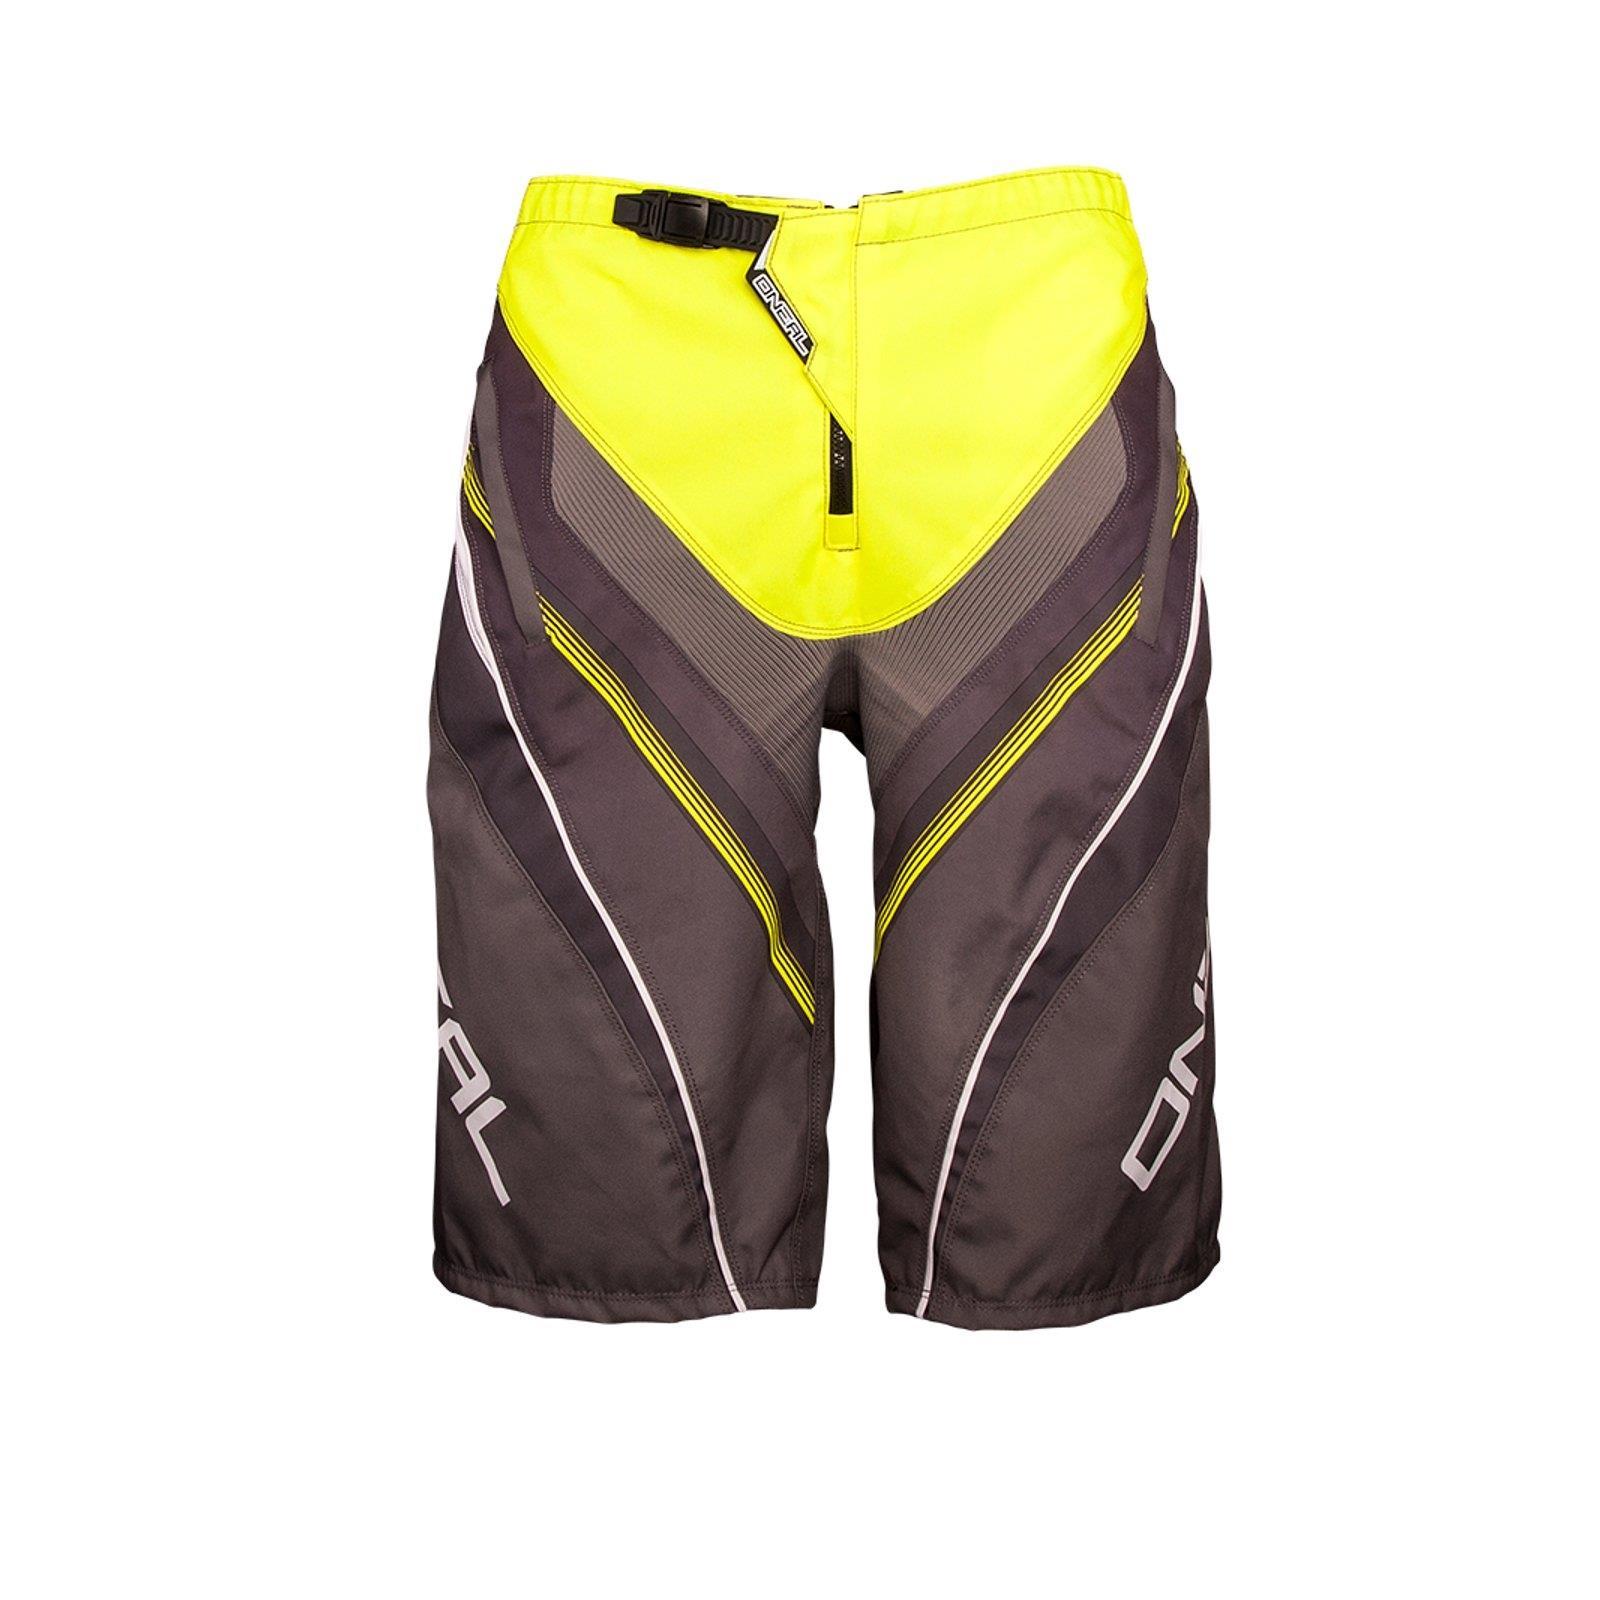 ONEAL-Element-FR-Short-Giallo-MTB-DH-MX-CROSS-SHORTS-PANTALONI-Downhill-Mountain-Bike-FR miniatura 7